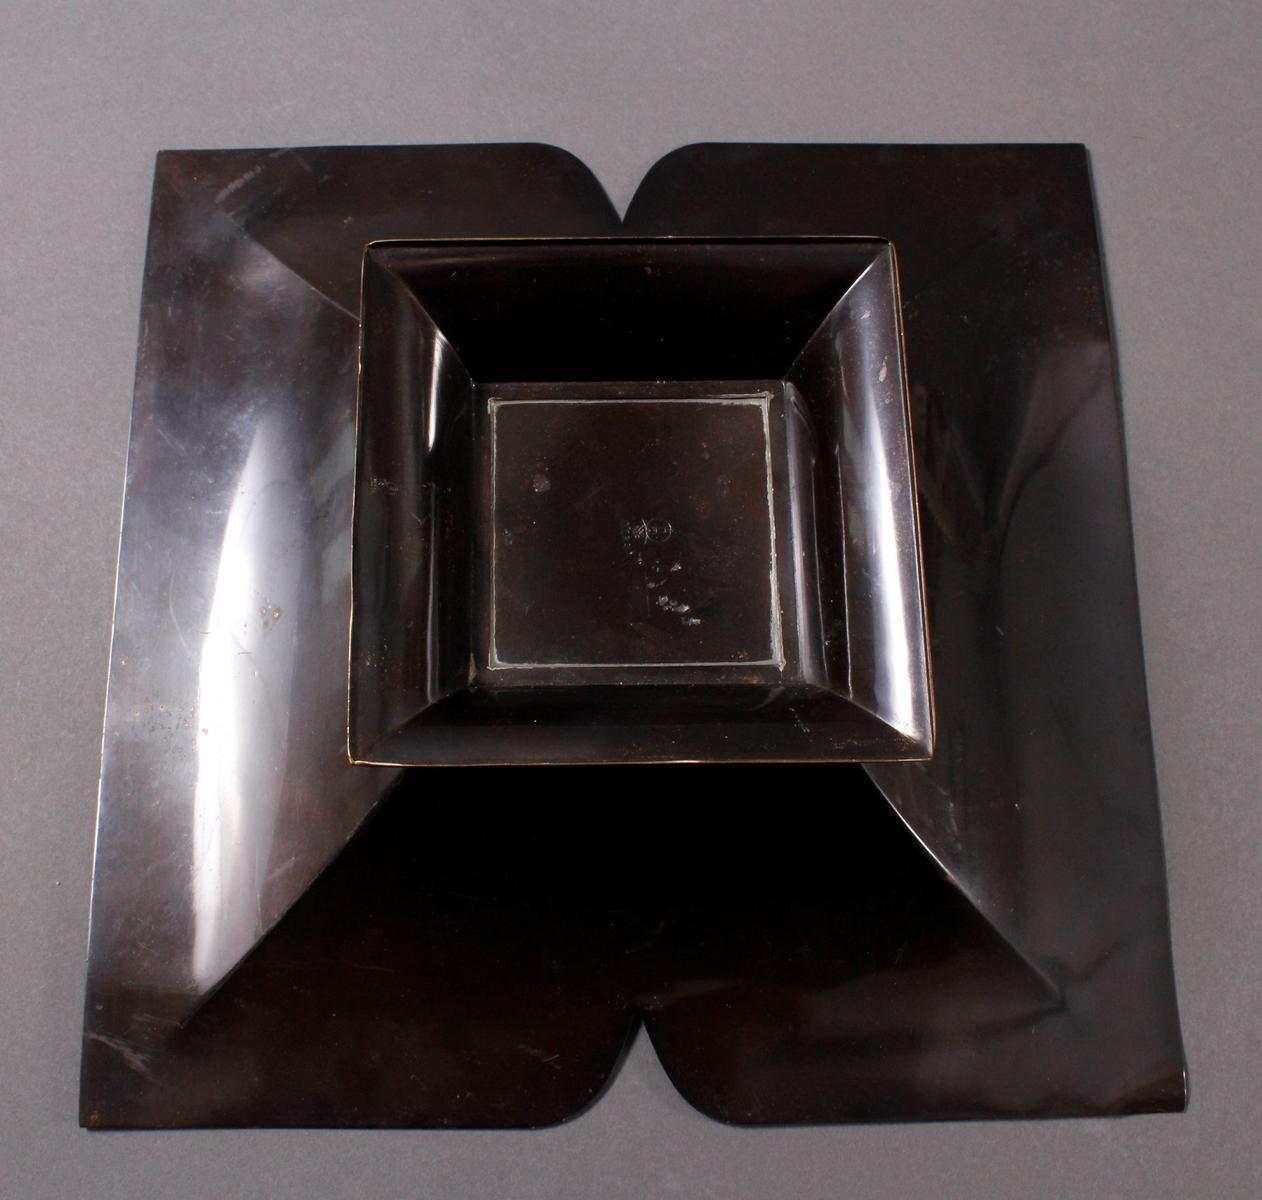 Messingzierschale WMF Ikora um 1925, Paul Haustein-4